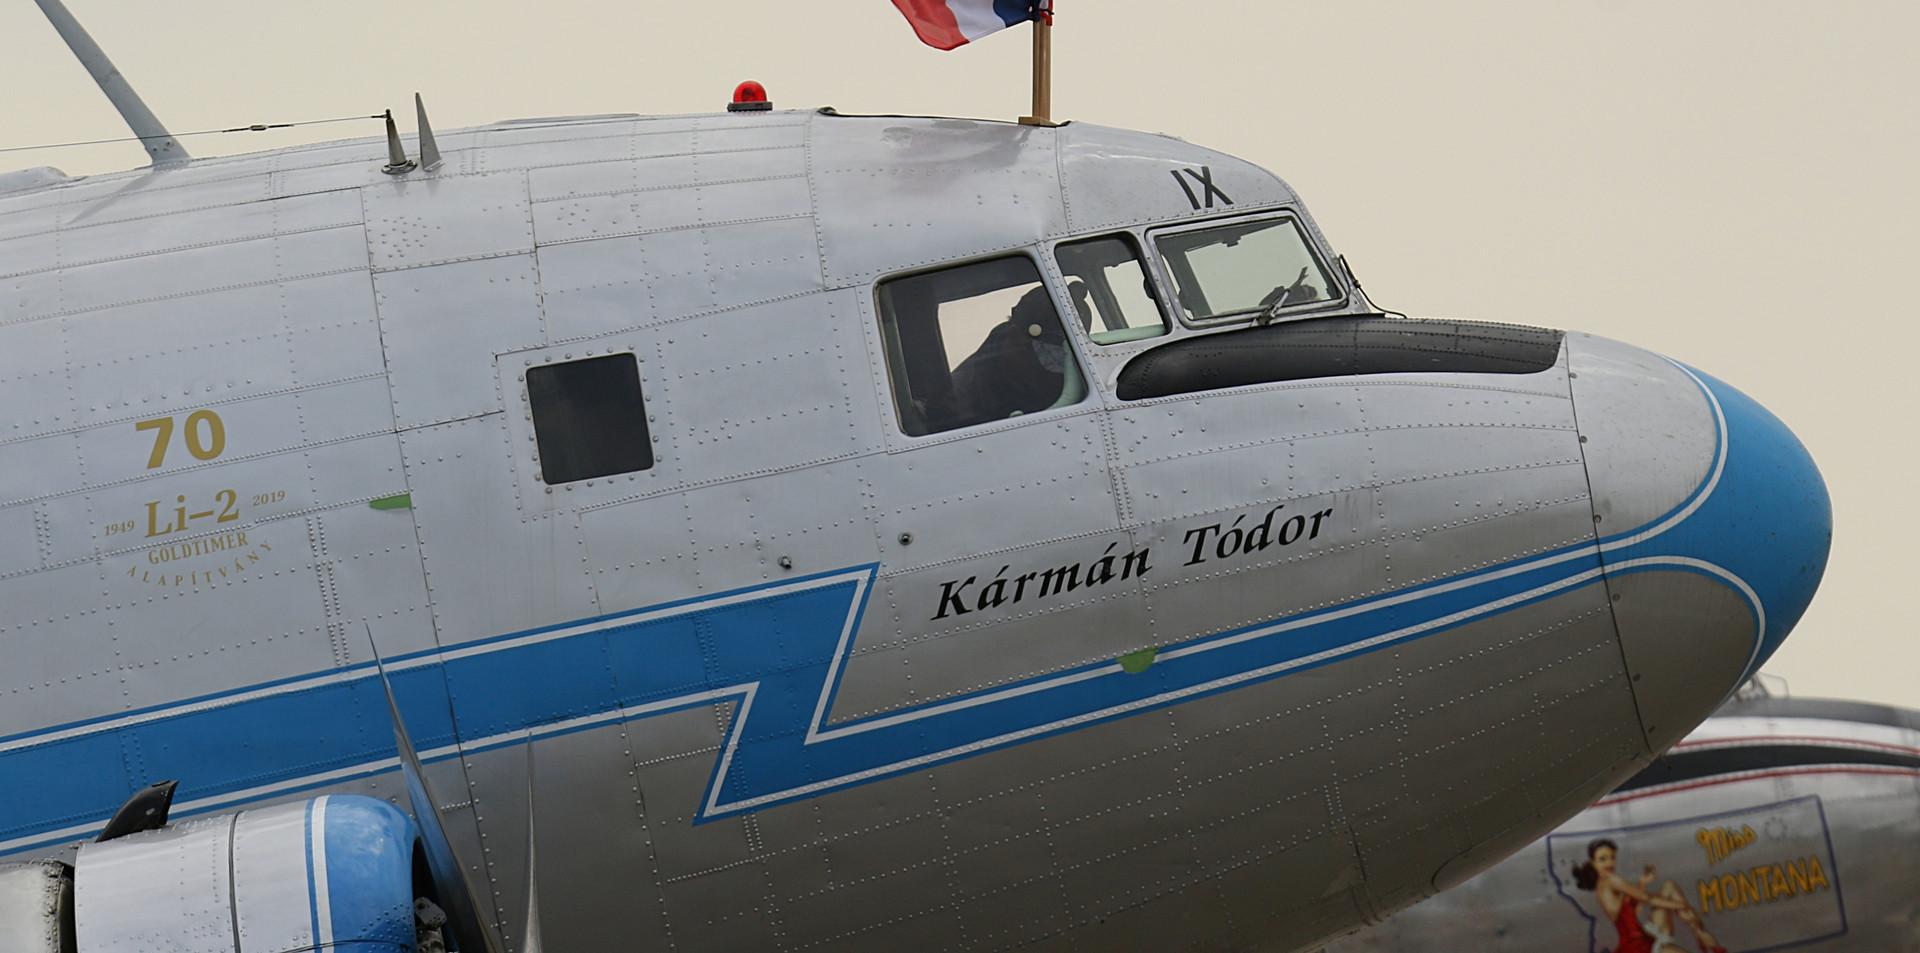 Li-2 Daks over Duxford June 2019 (17).JP